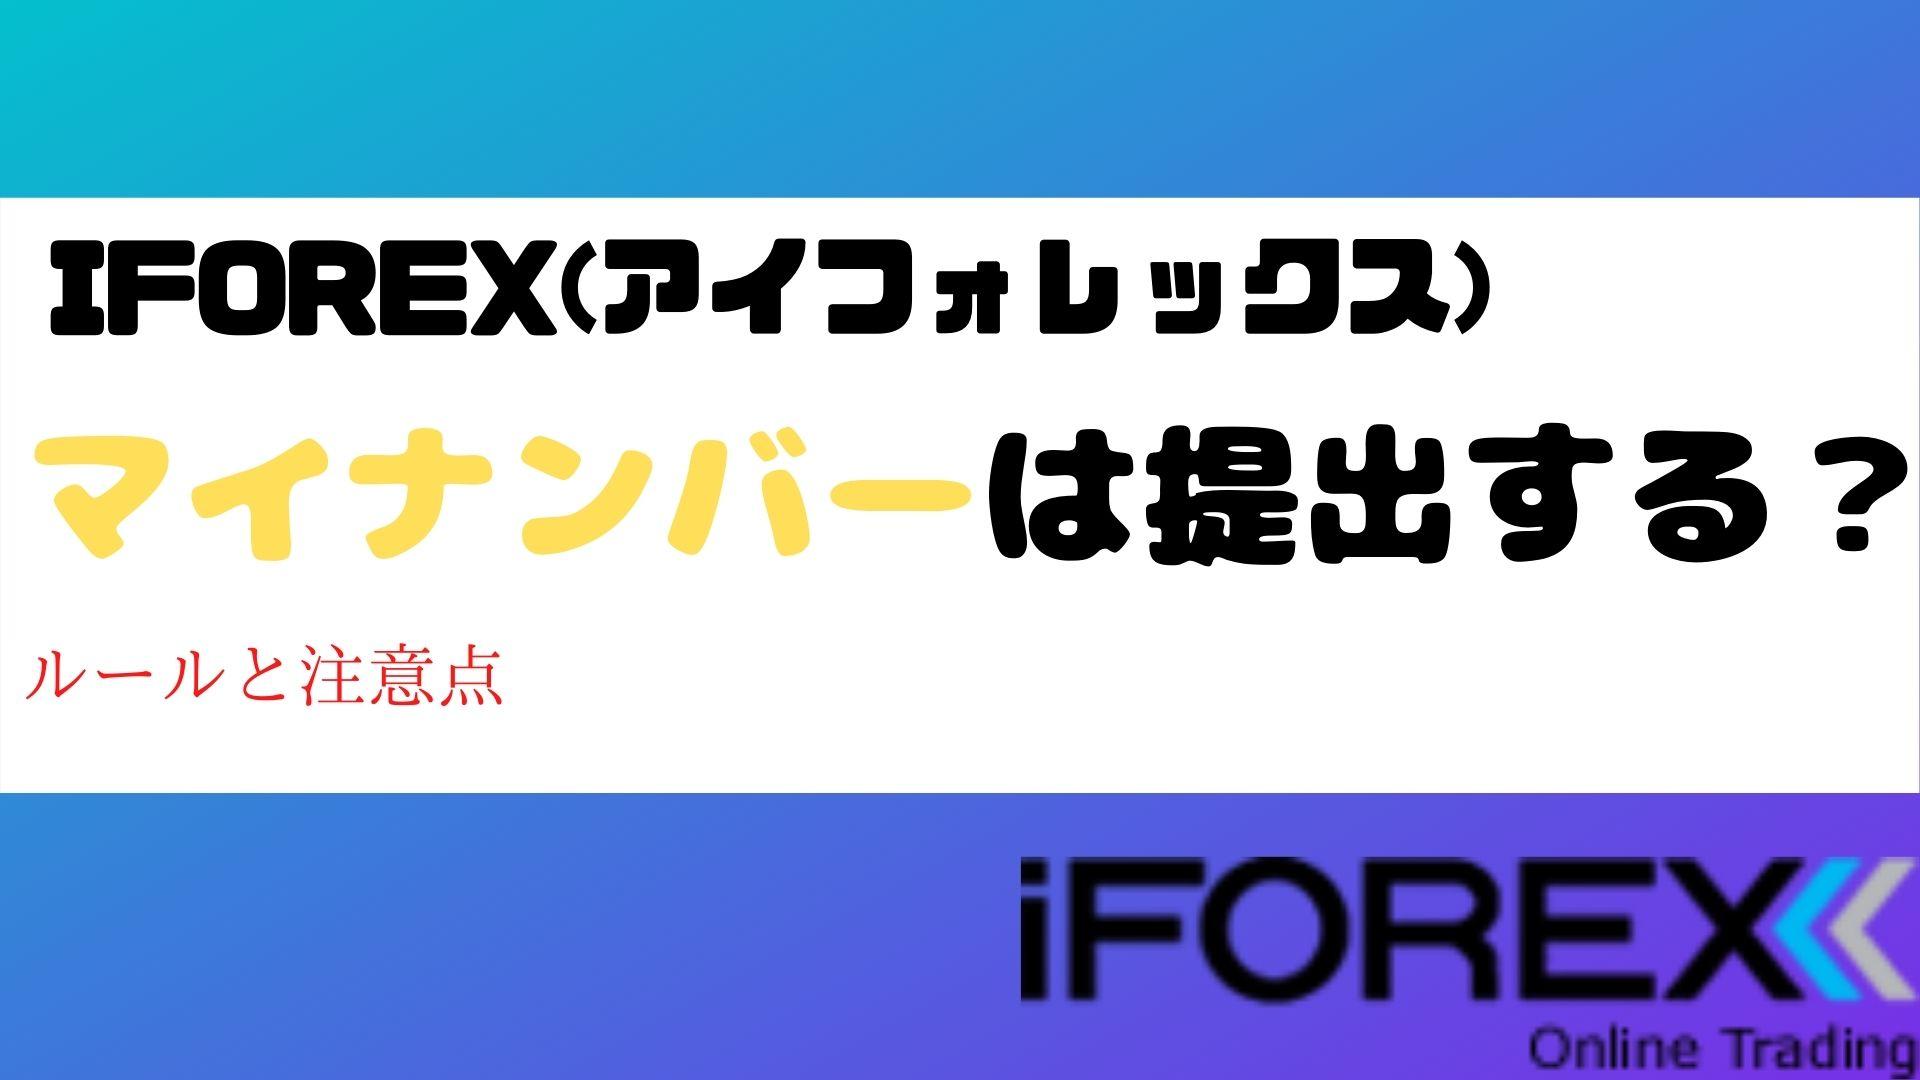 iforex-mynumber-title